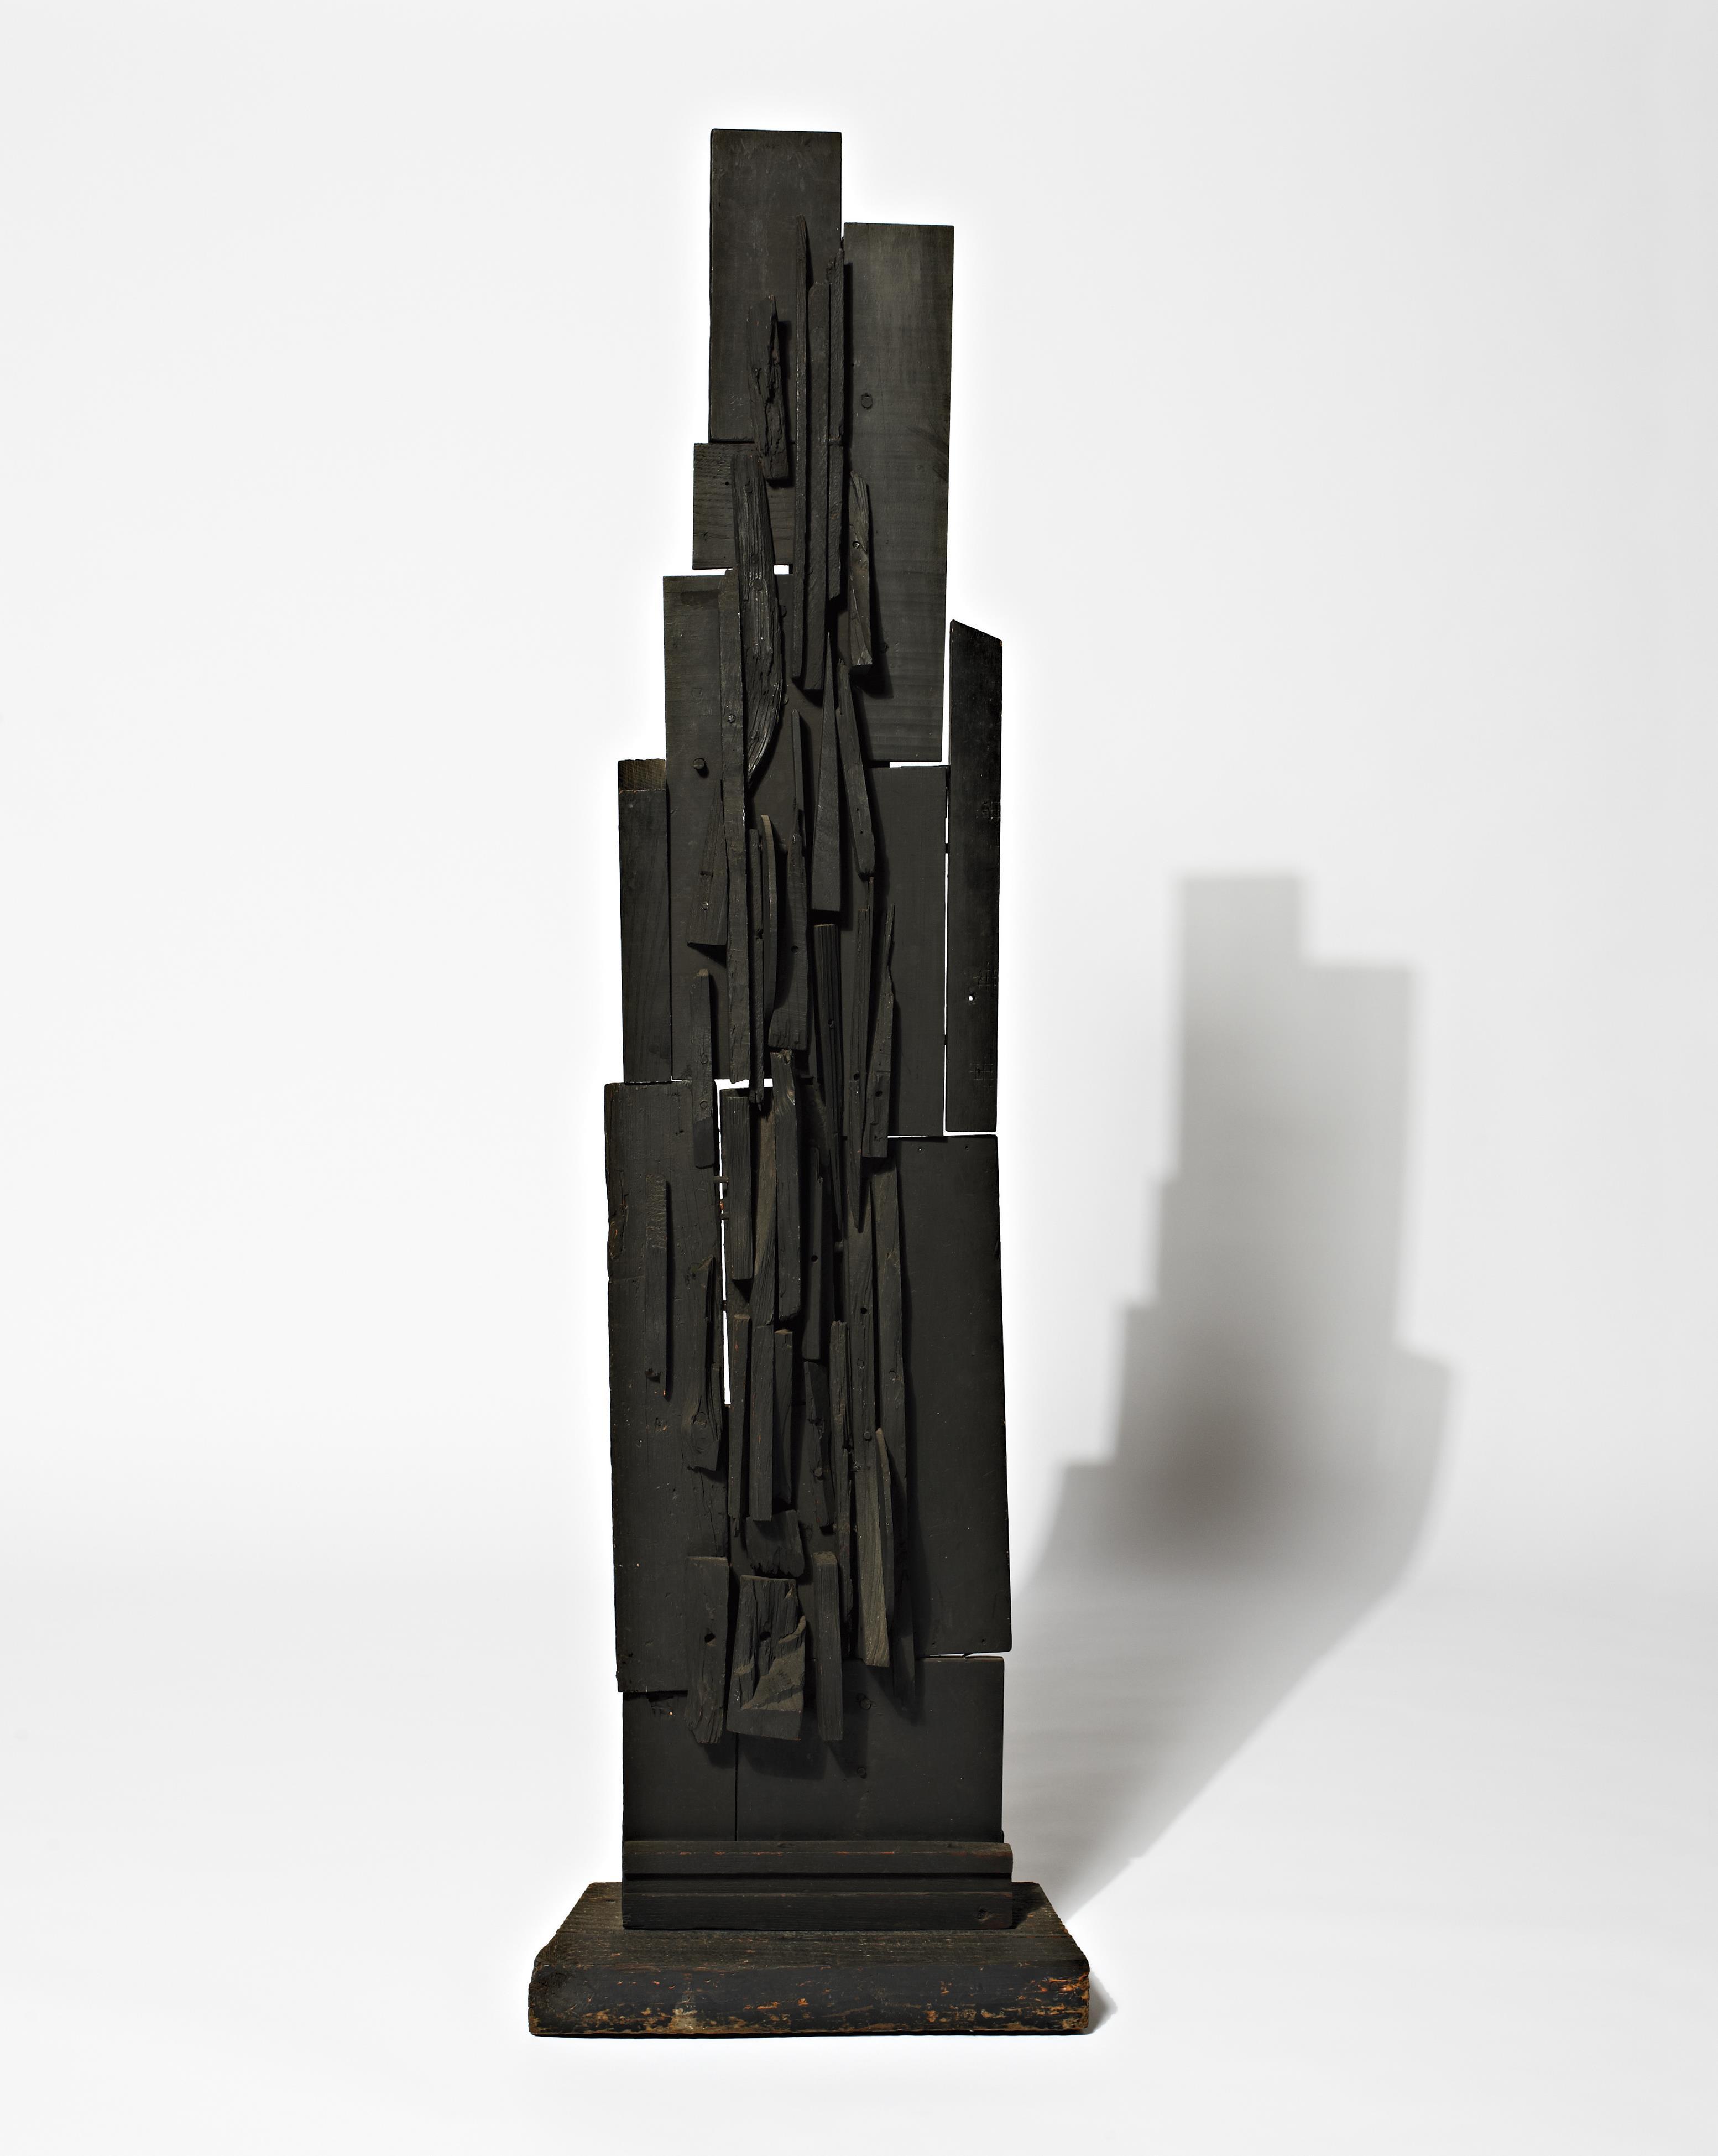 louisenevelson_spire_64x18375x9.5_woodpaintedblack_circa1950-1959